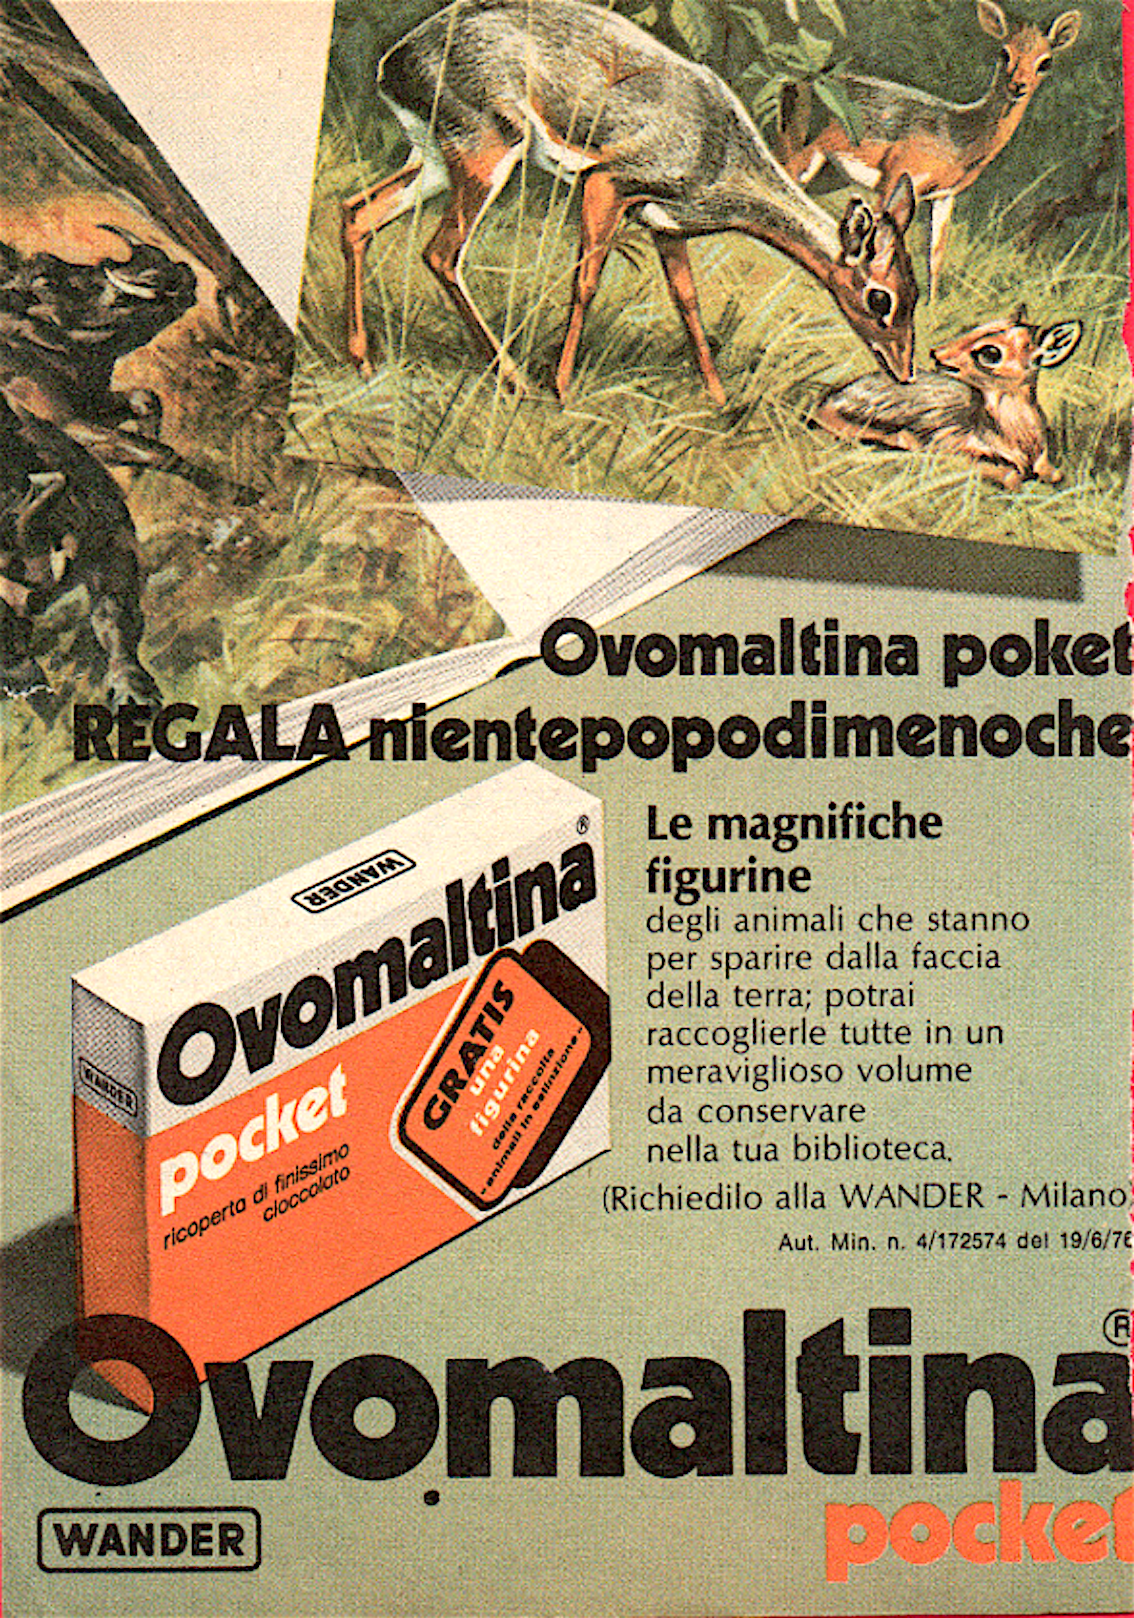 ovomaltina-pocket-pubblicita-1976